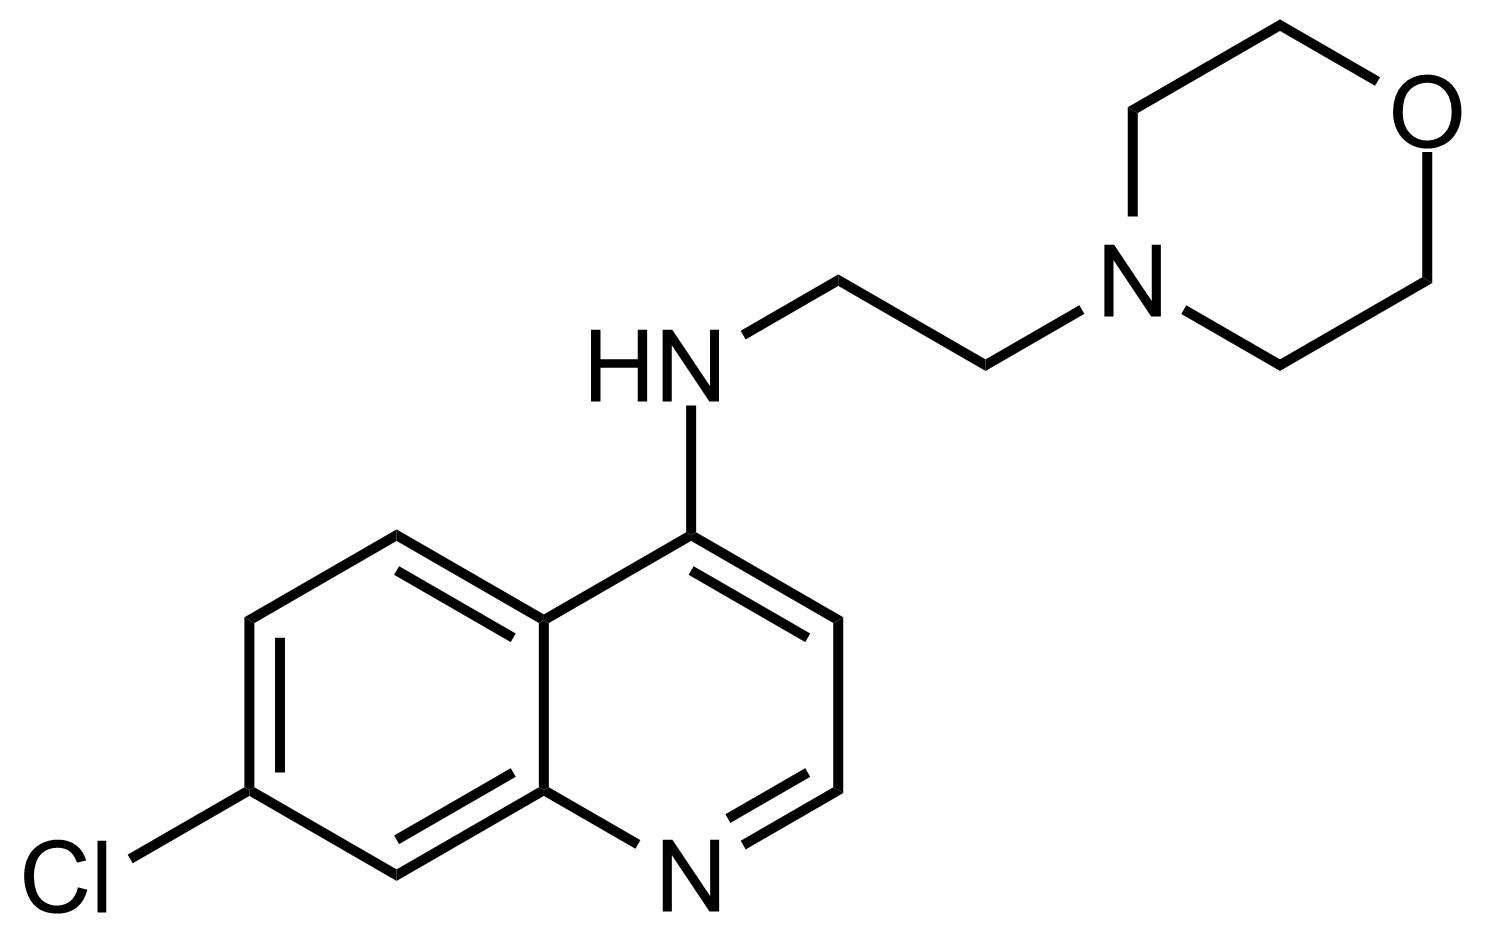 Structure of 7-Chloro-N-(2-morpholinoethyl)quinolin-4-amine